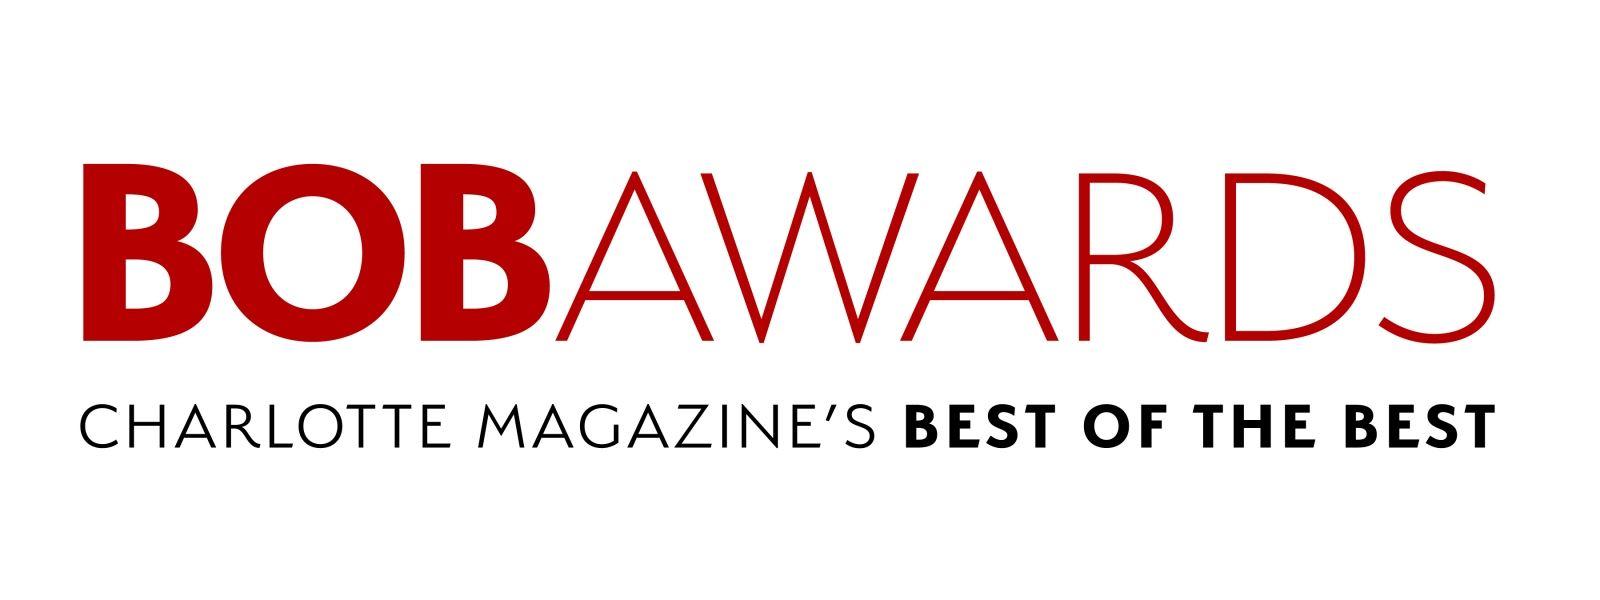 Charlotte Magazine's Best of the Best Awards